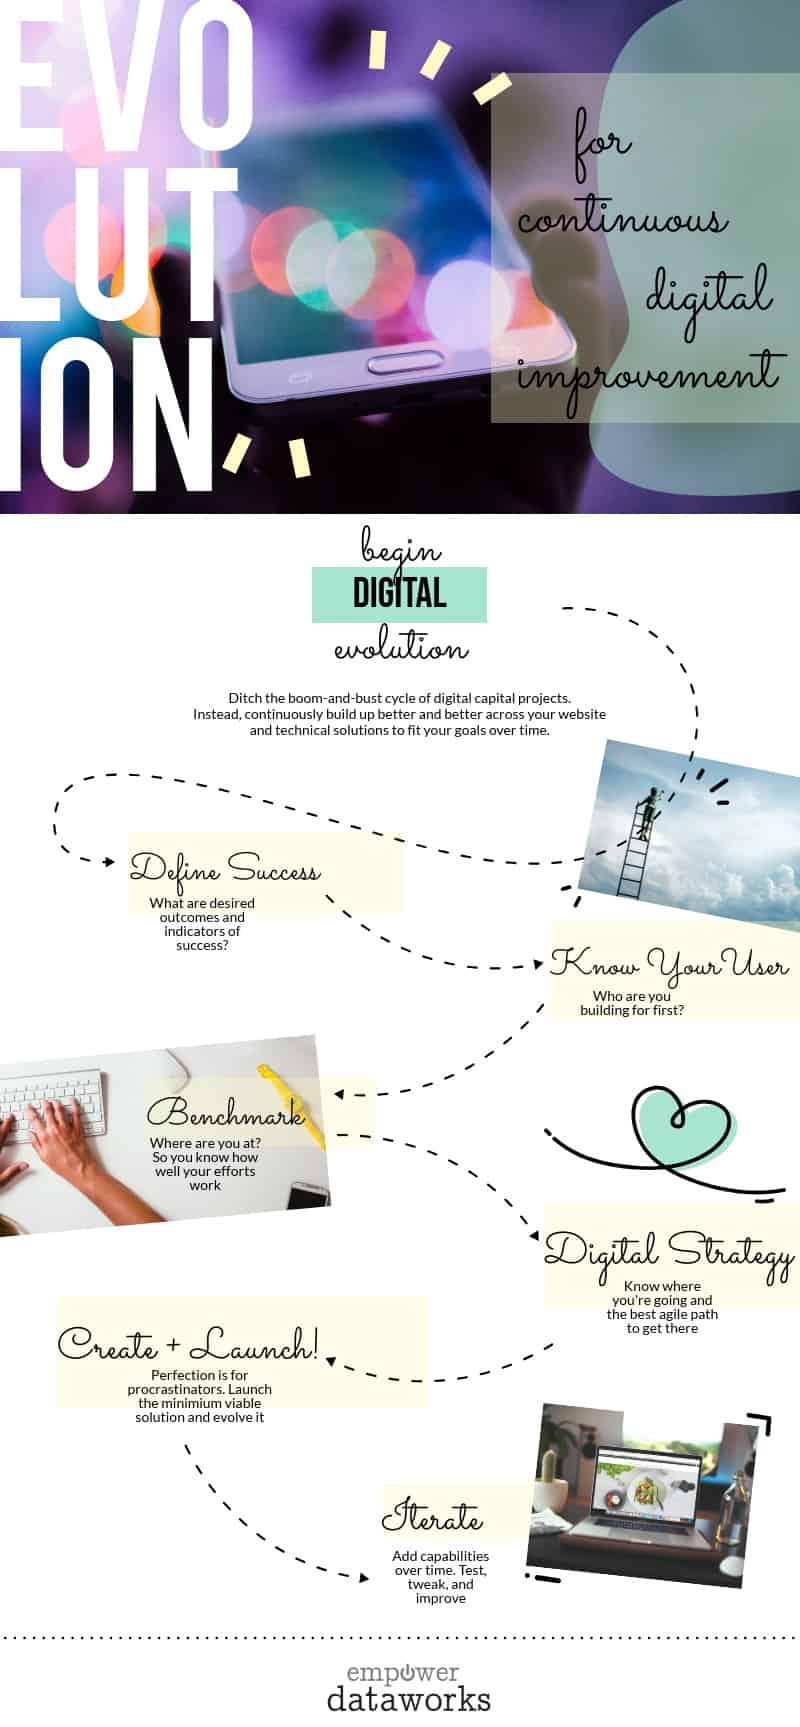 digital evolution process infographic